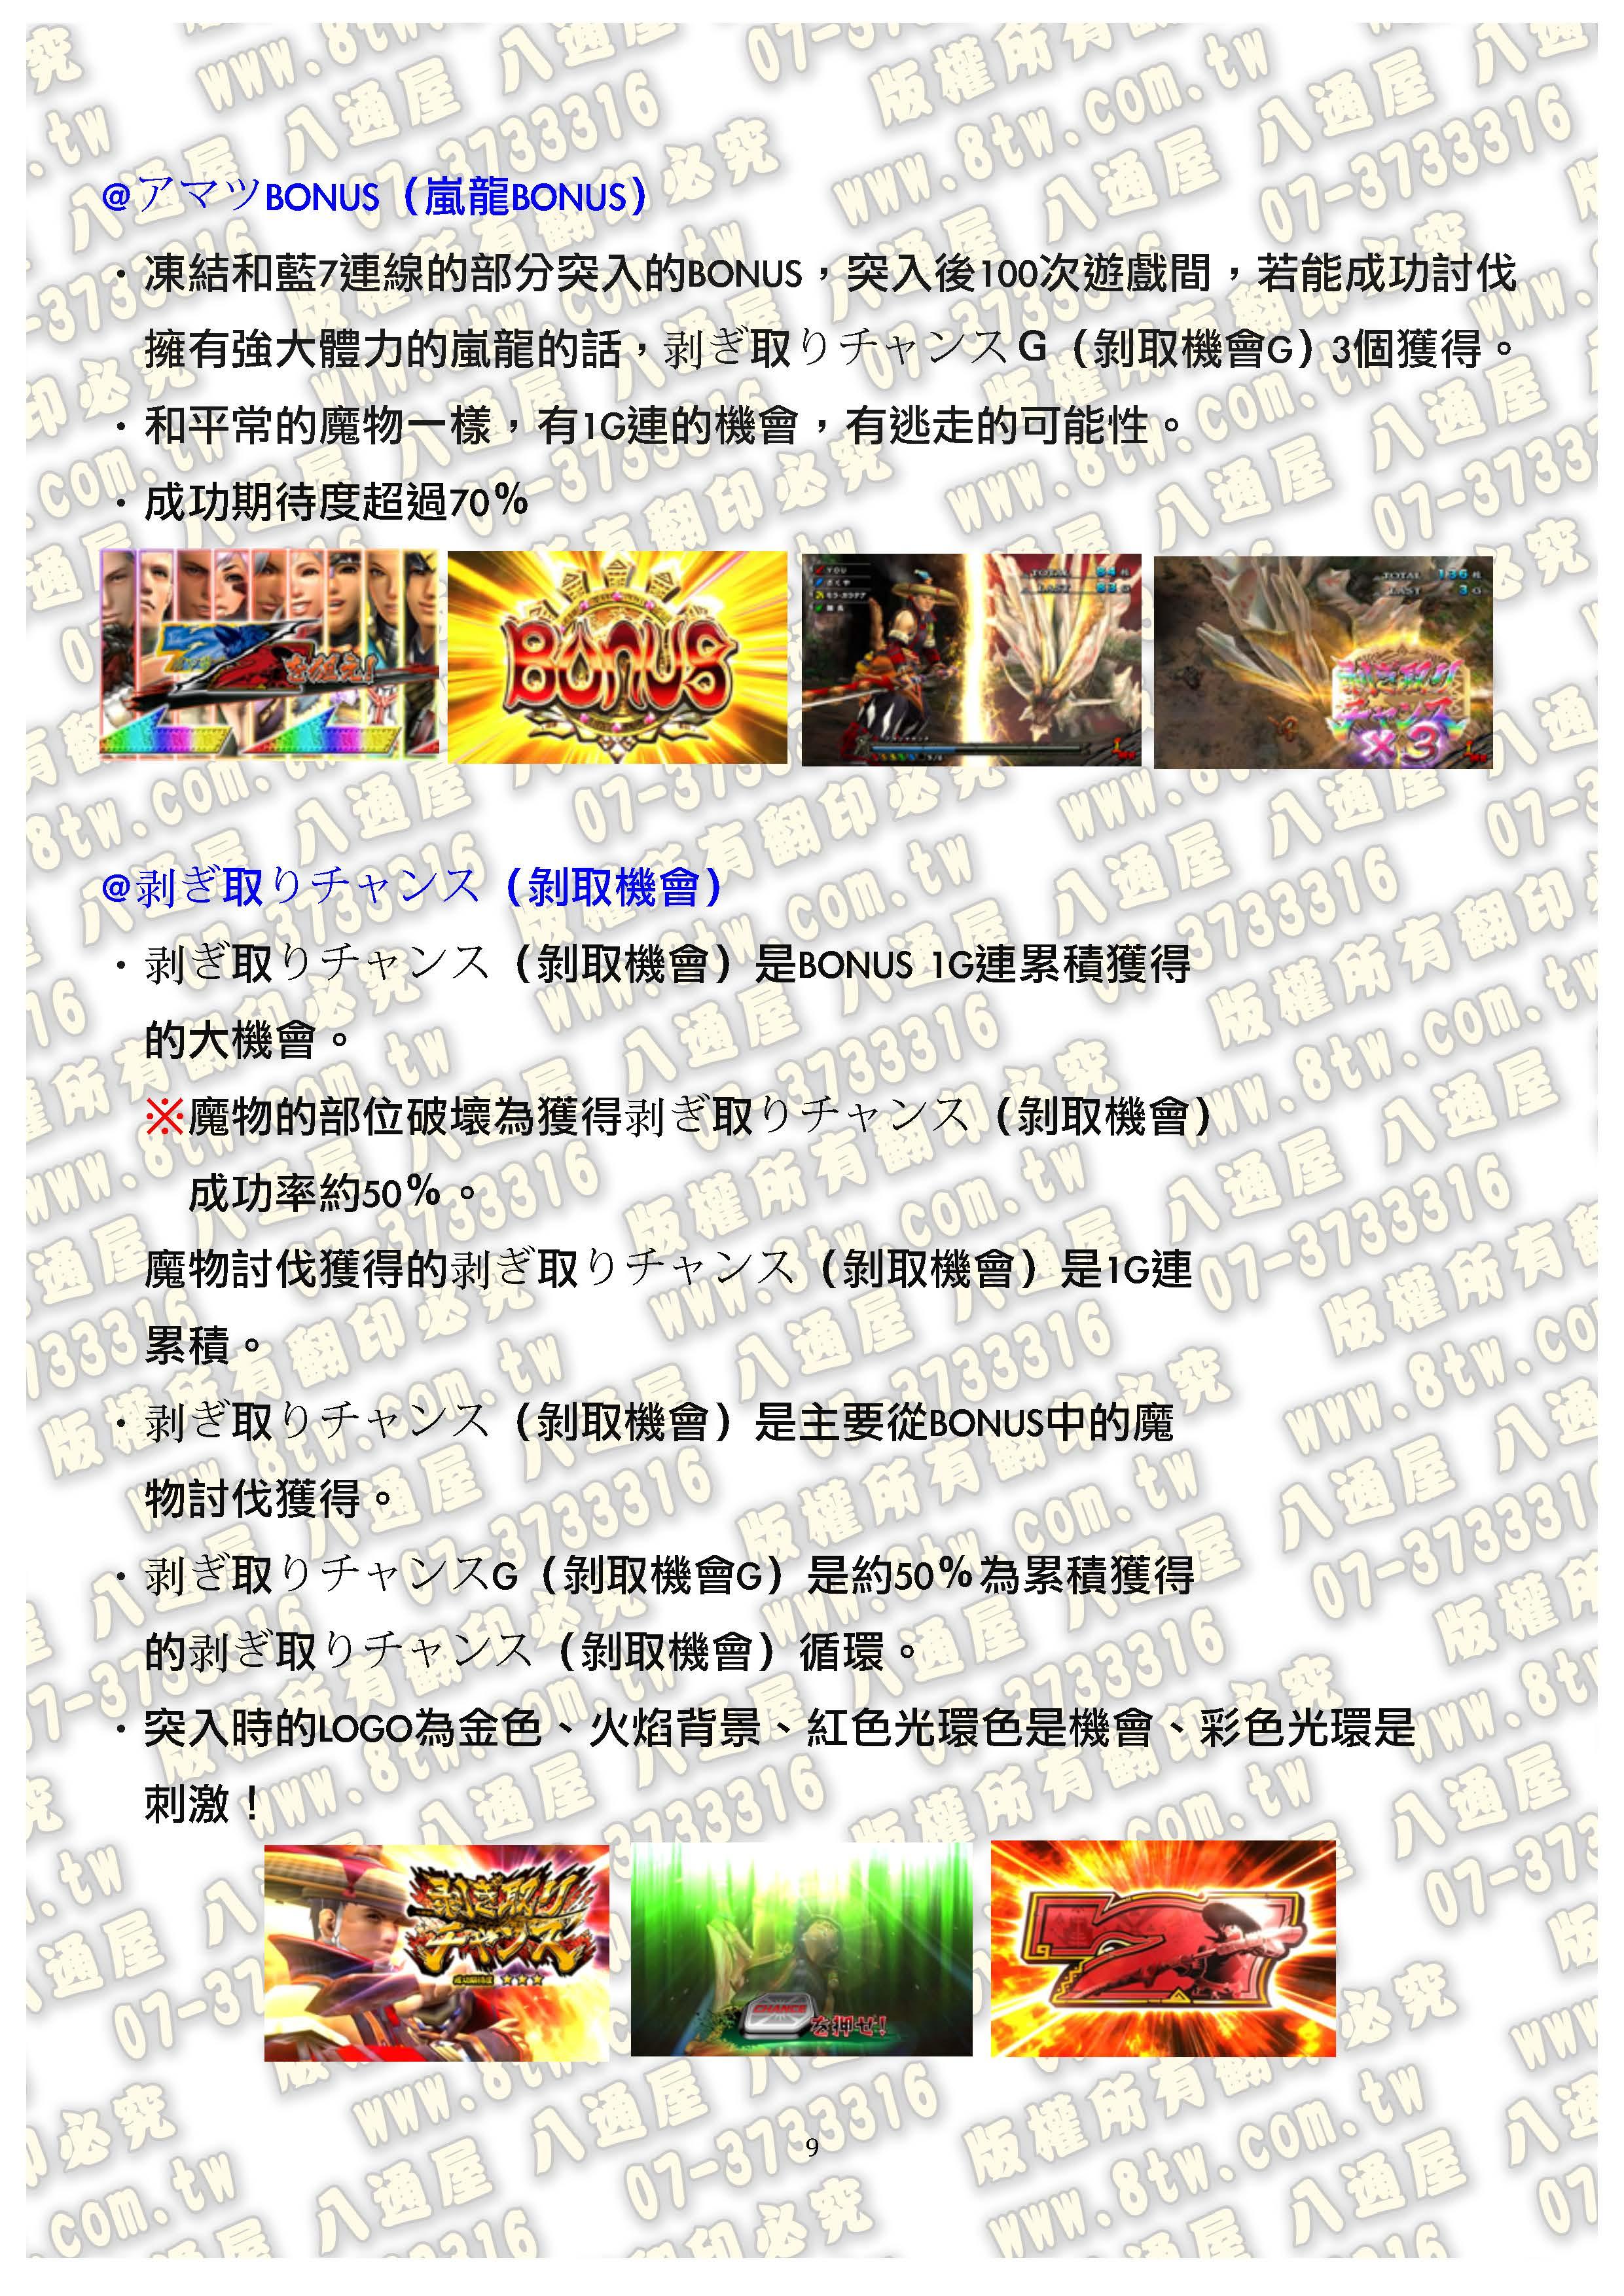 S0202魔物獵人 月下雷鳴 中文版攻略_Page_10